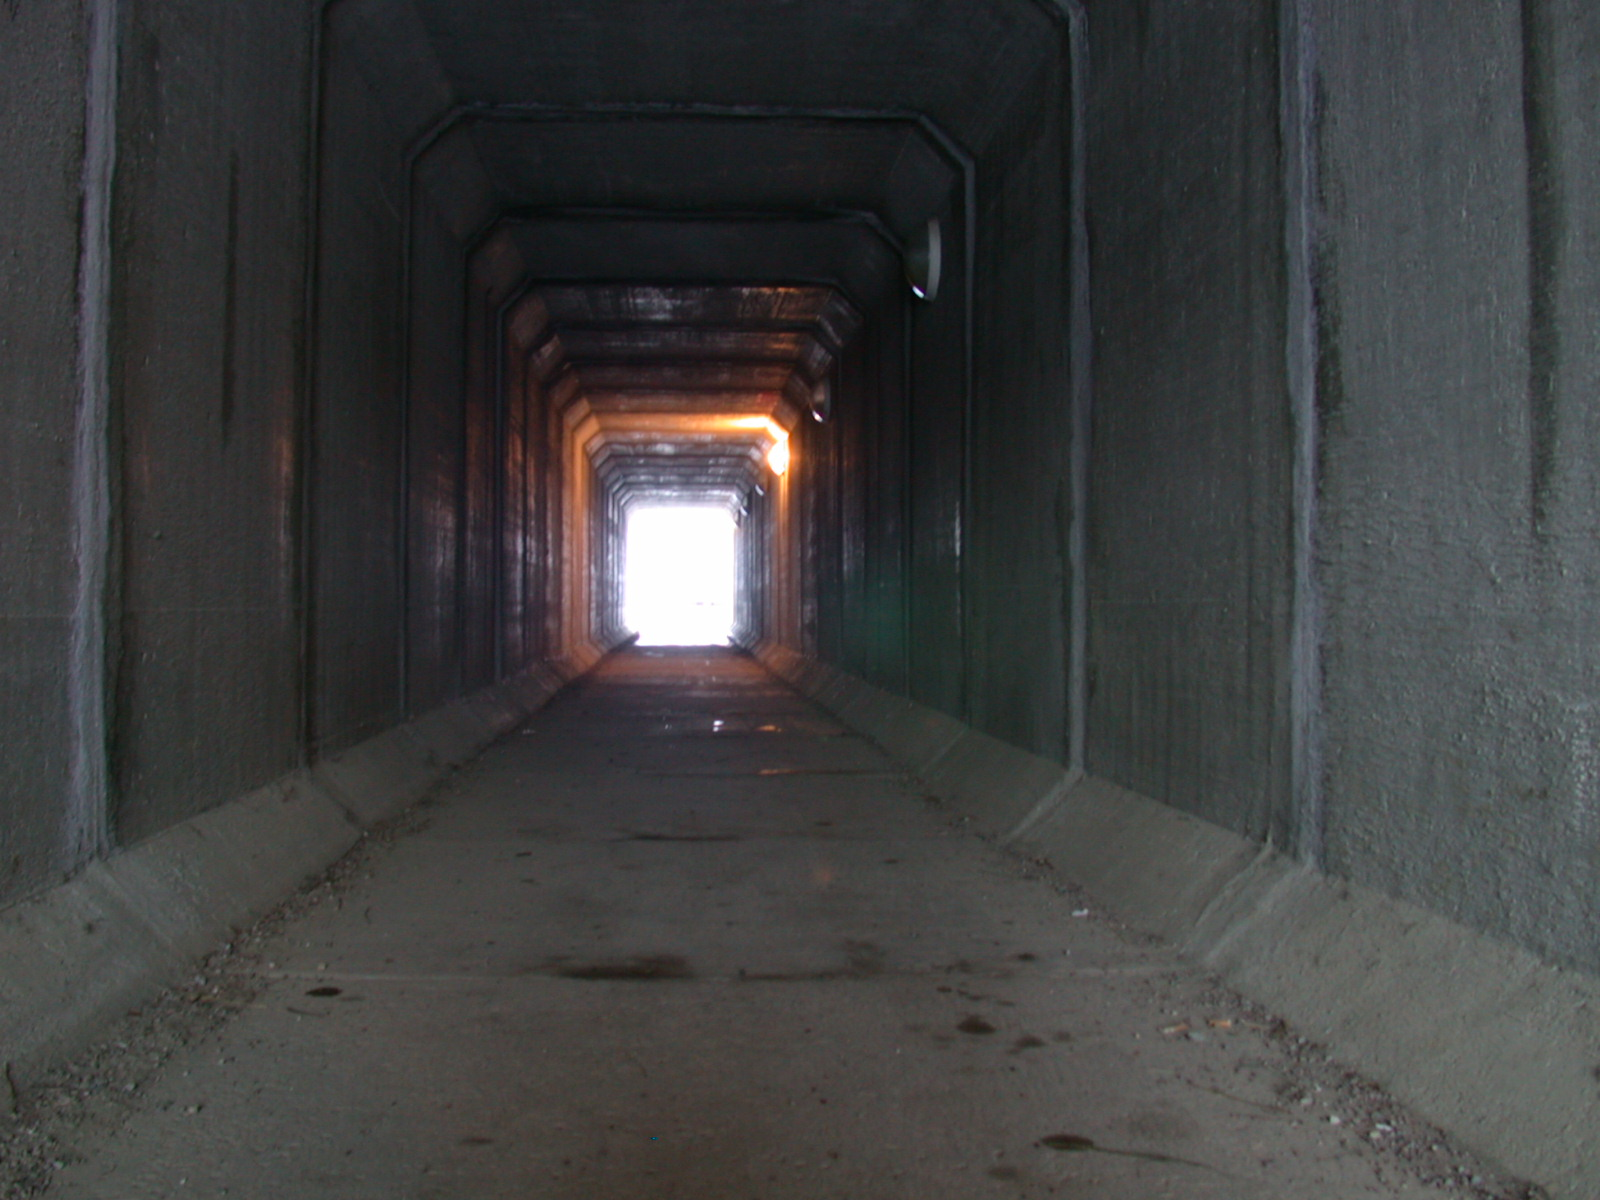 lightattheendofthetunnel tunnel box boxed square rectangle light tunnelling architecture interiors concrete